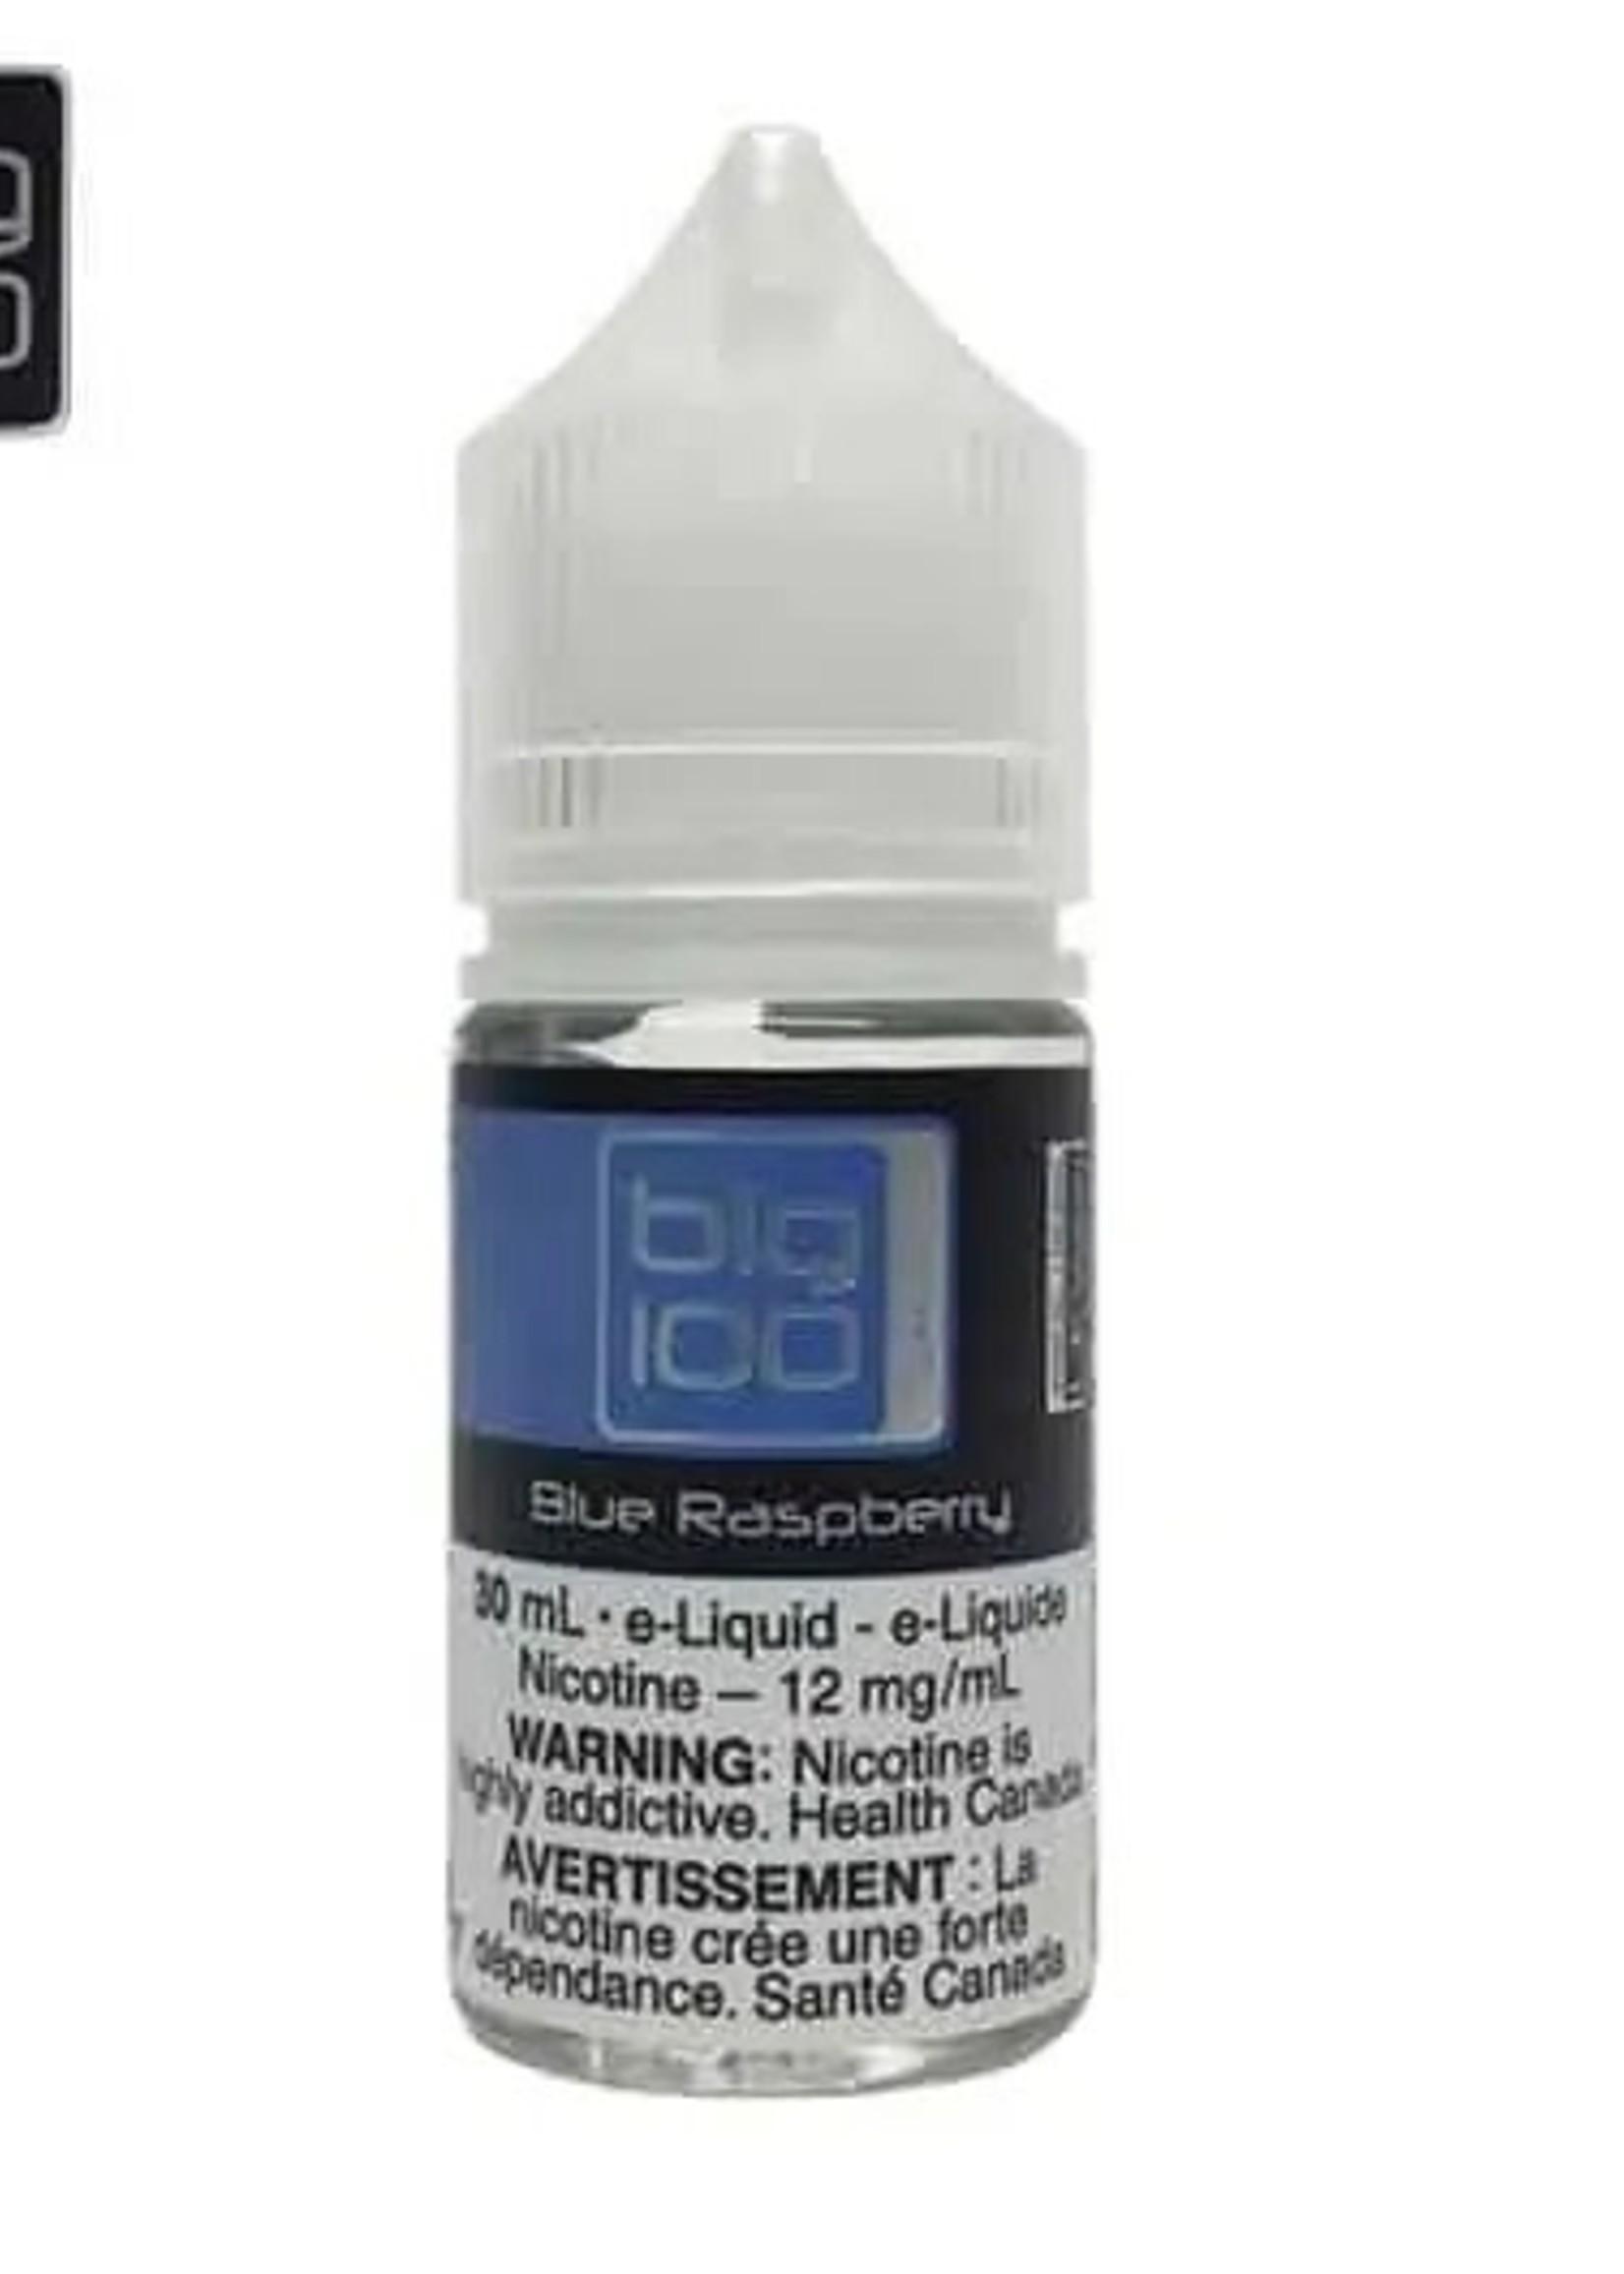 Big 100 Big100 Blue Raspberry Salt